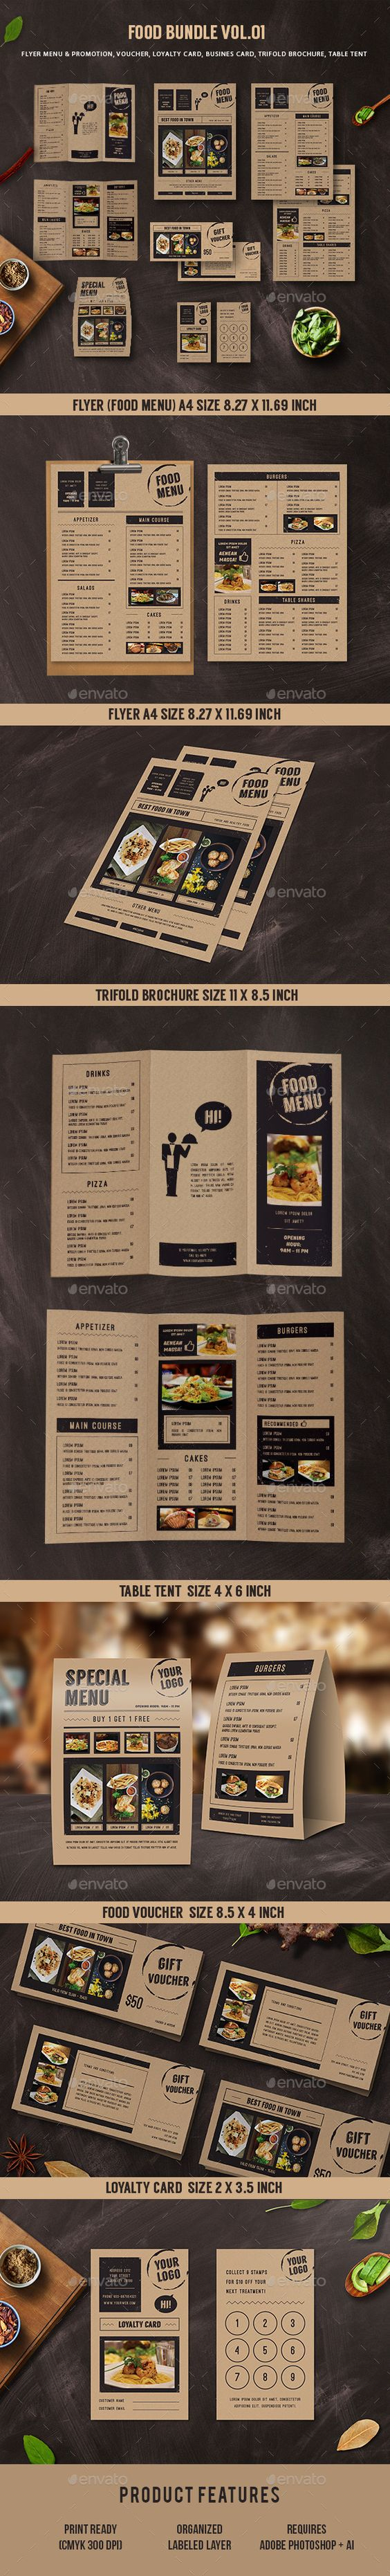 Food Menu Bundle Template PSD, AI Illustrator. Download here: https://graphicriver.net/item/food-menu-bundle/17416440?ref=ksioks